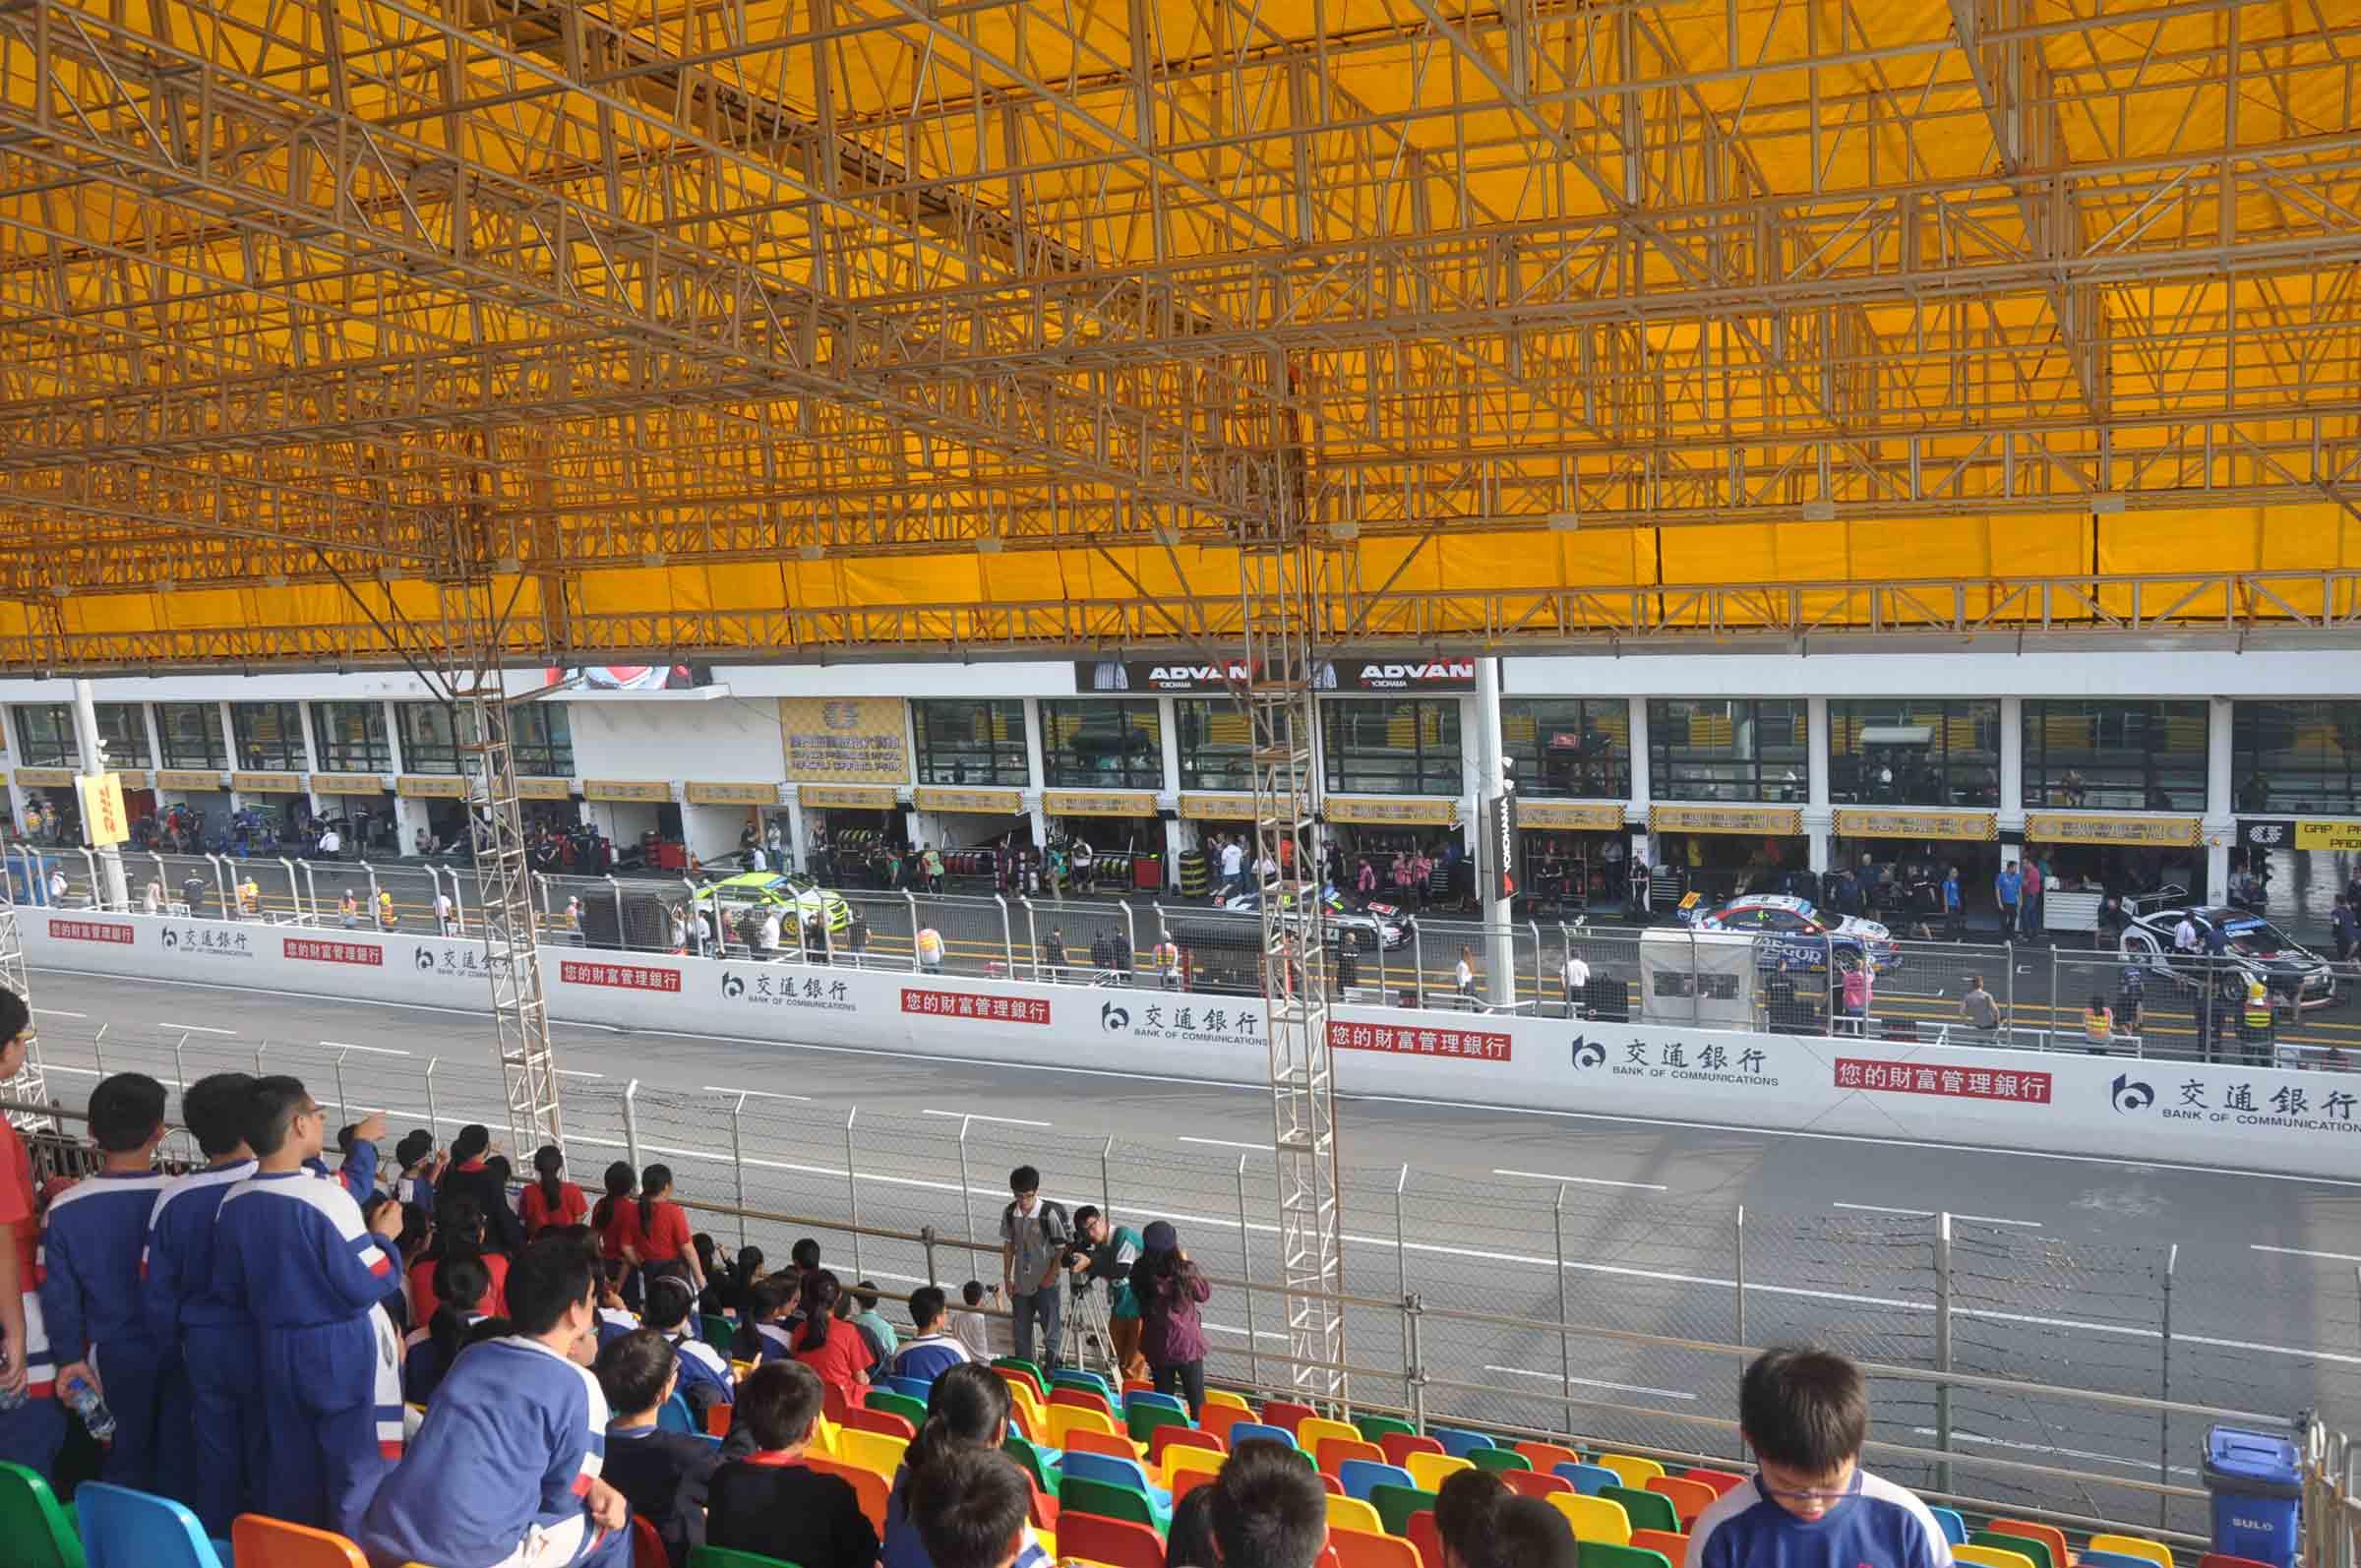 F3 Macau Grand Prix Race View from the Grandstand Seats